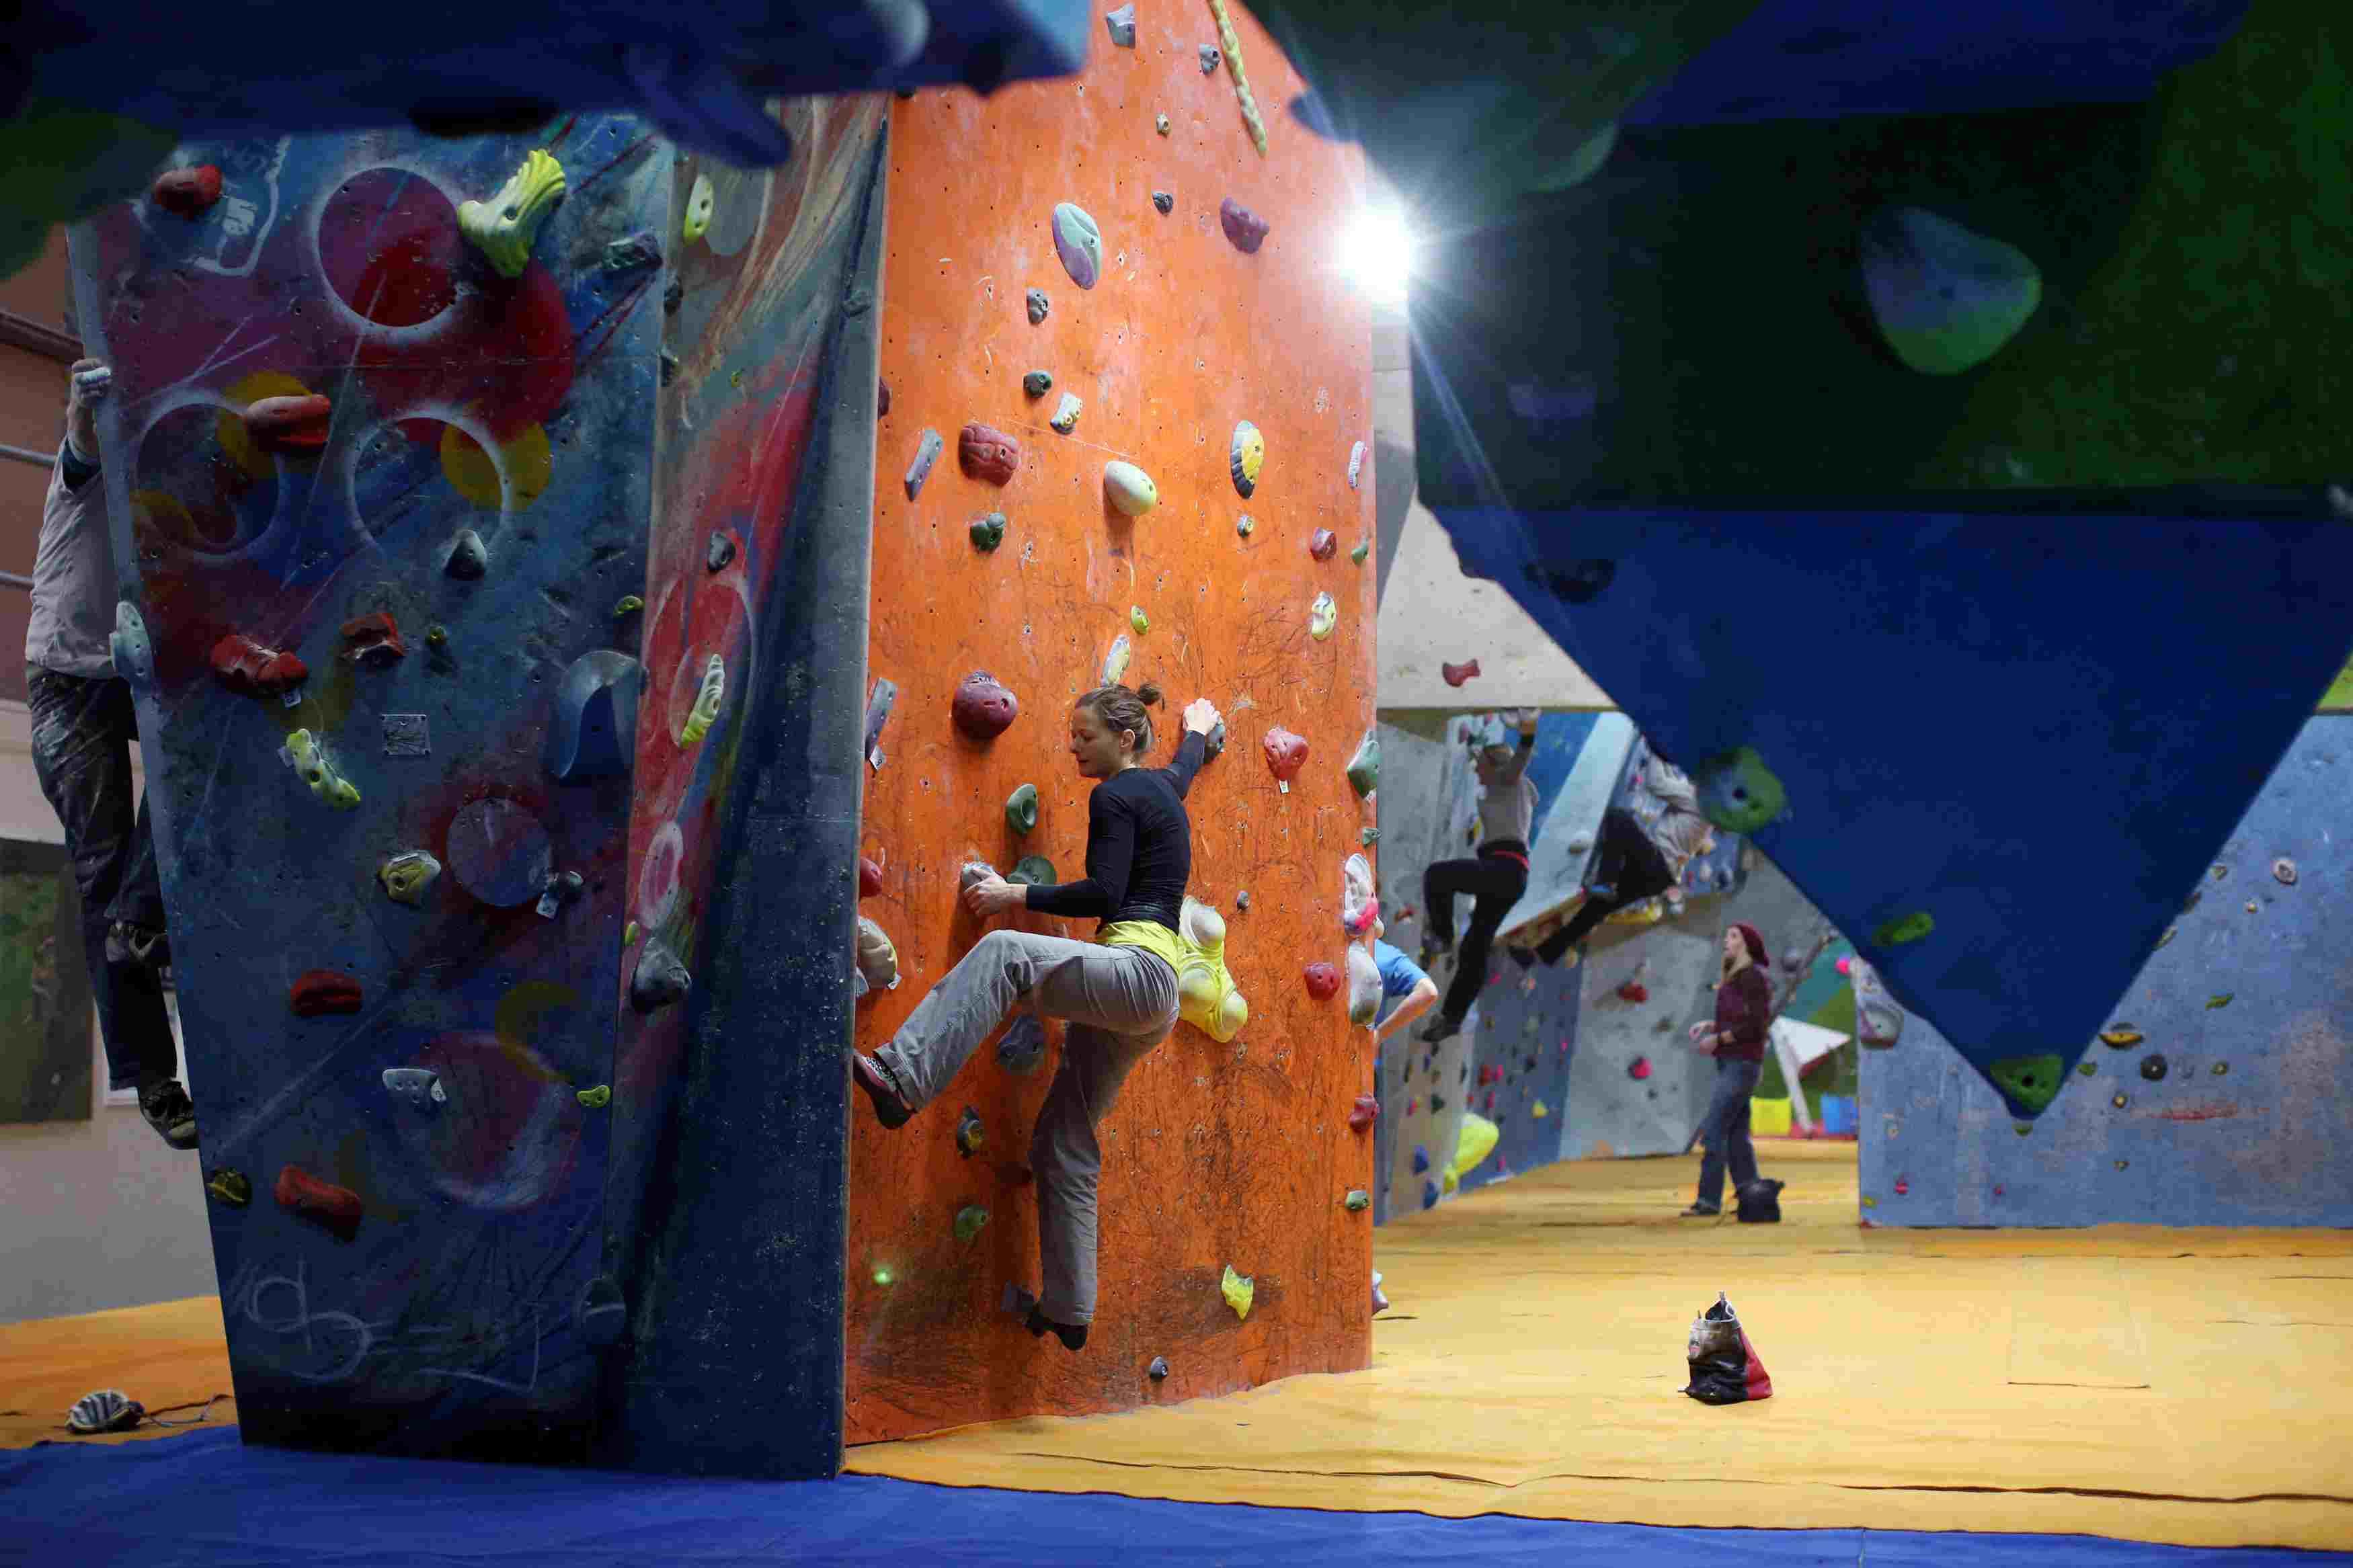 escalada en roca.jpg